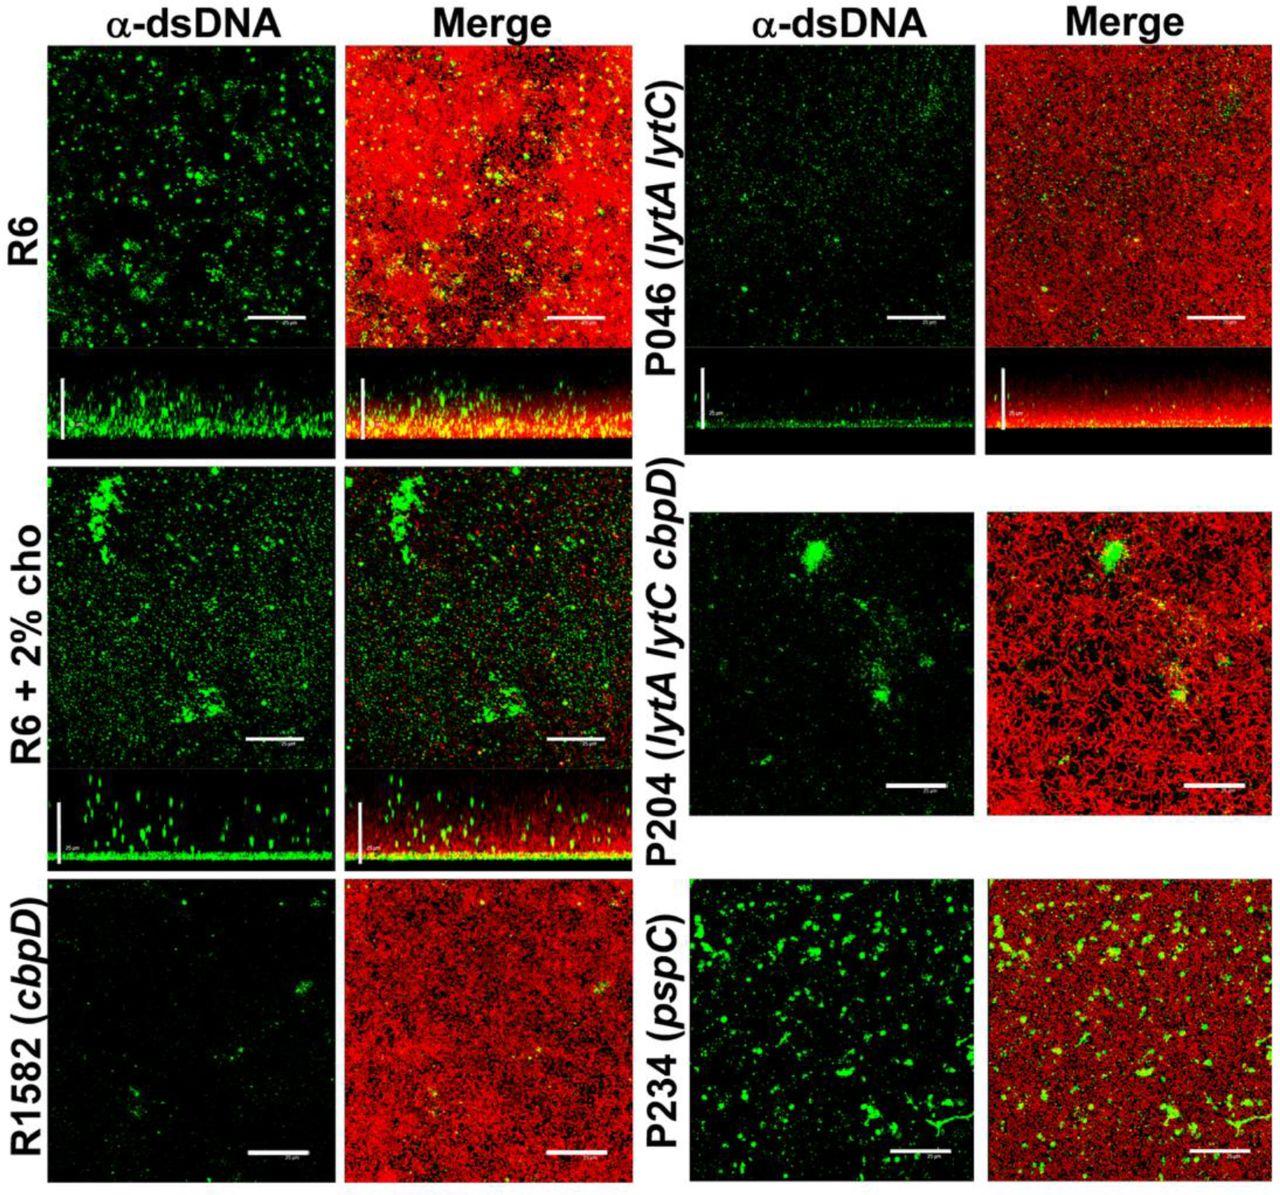 Autolysin-Independent DNA Release in Streptococcus pneumoniae in